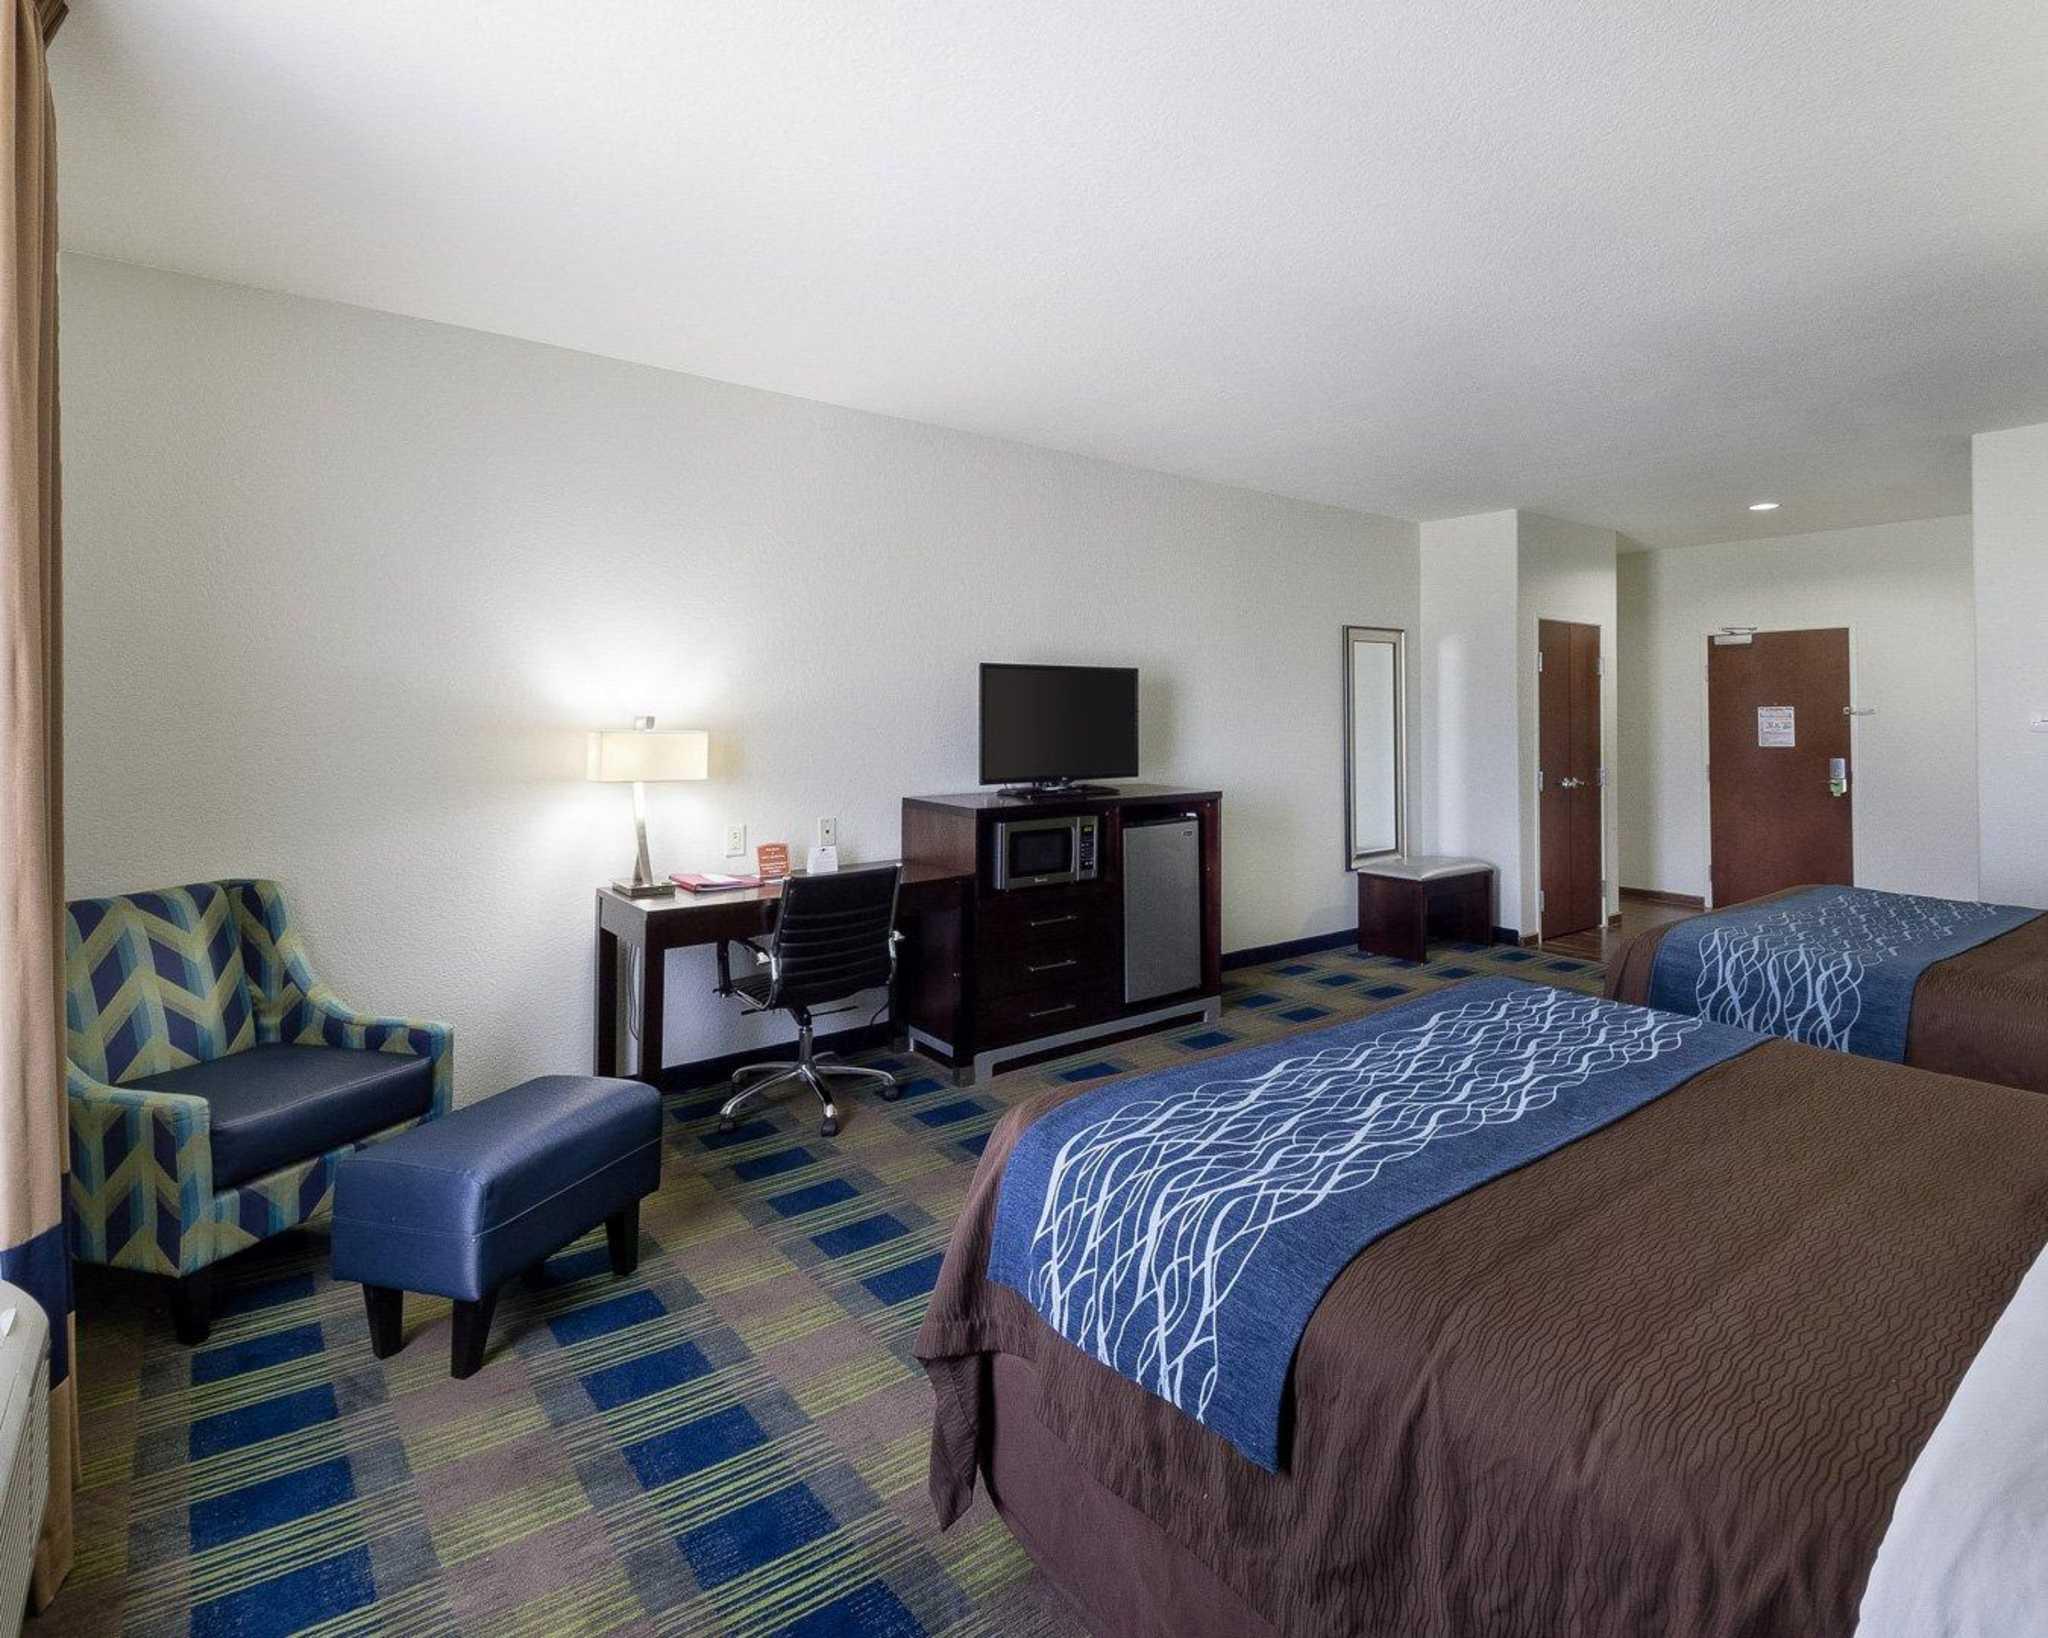 Comfort Inn & Suites image 7